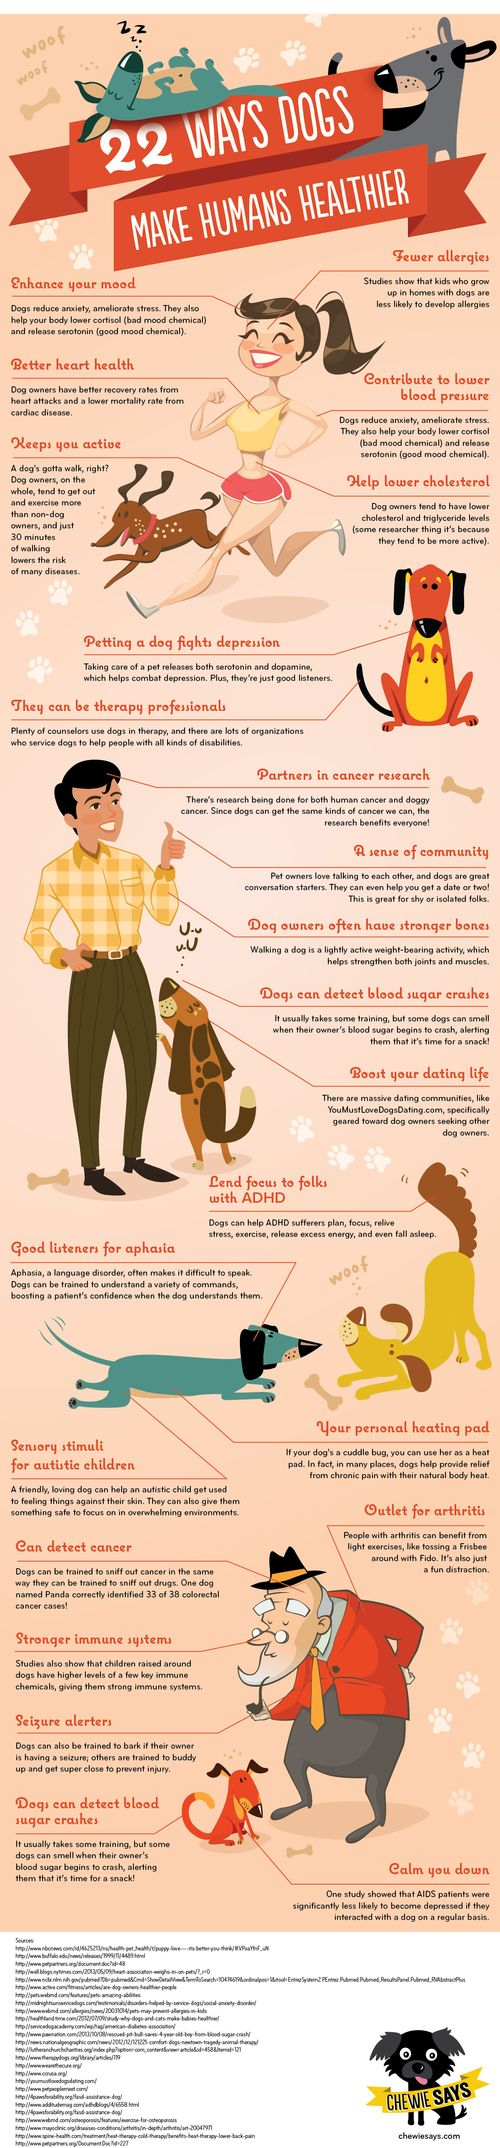 22 Ways Dogs Help Make Humans Healthier - Big (2)